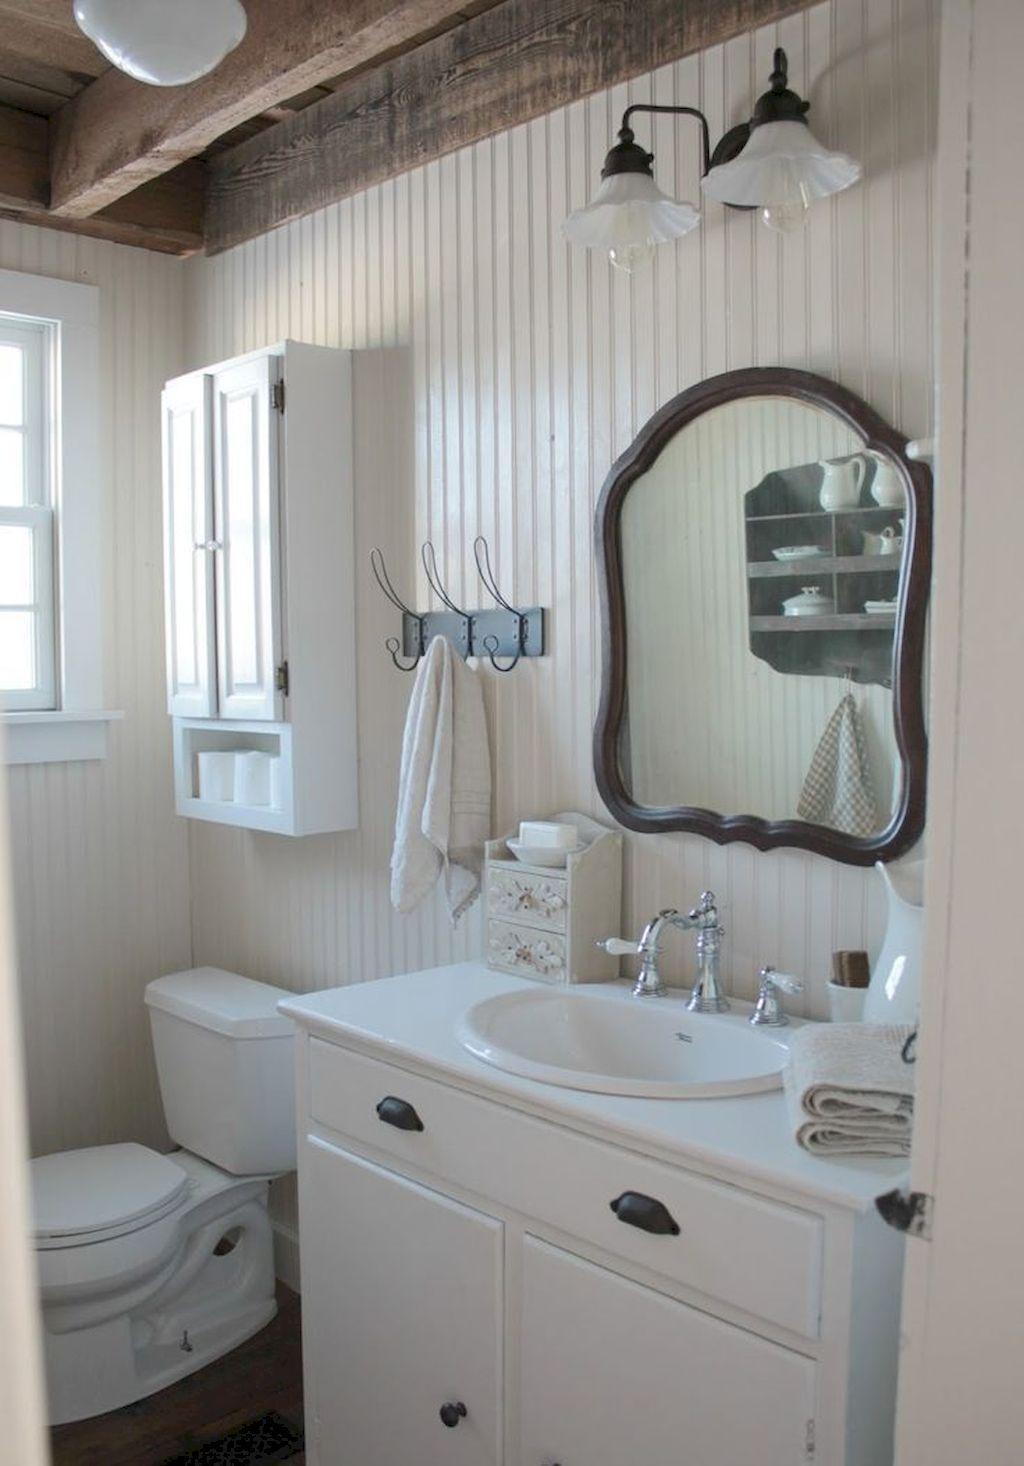 Best bathroom interior best inspire farmhouse bathroom design and decor ideas   cool